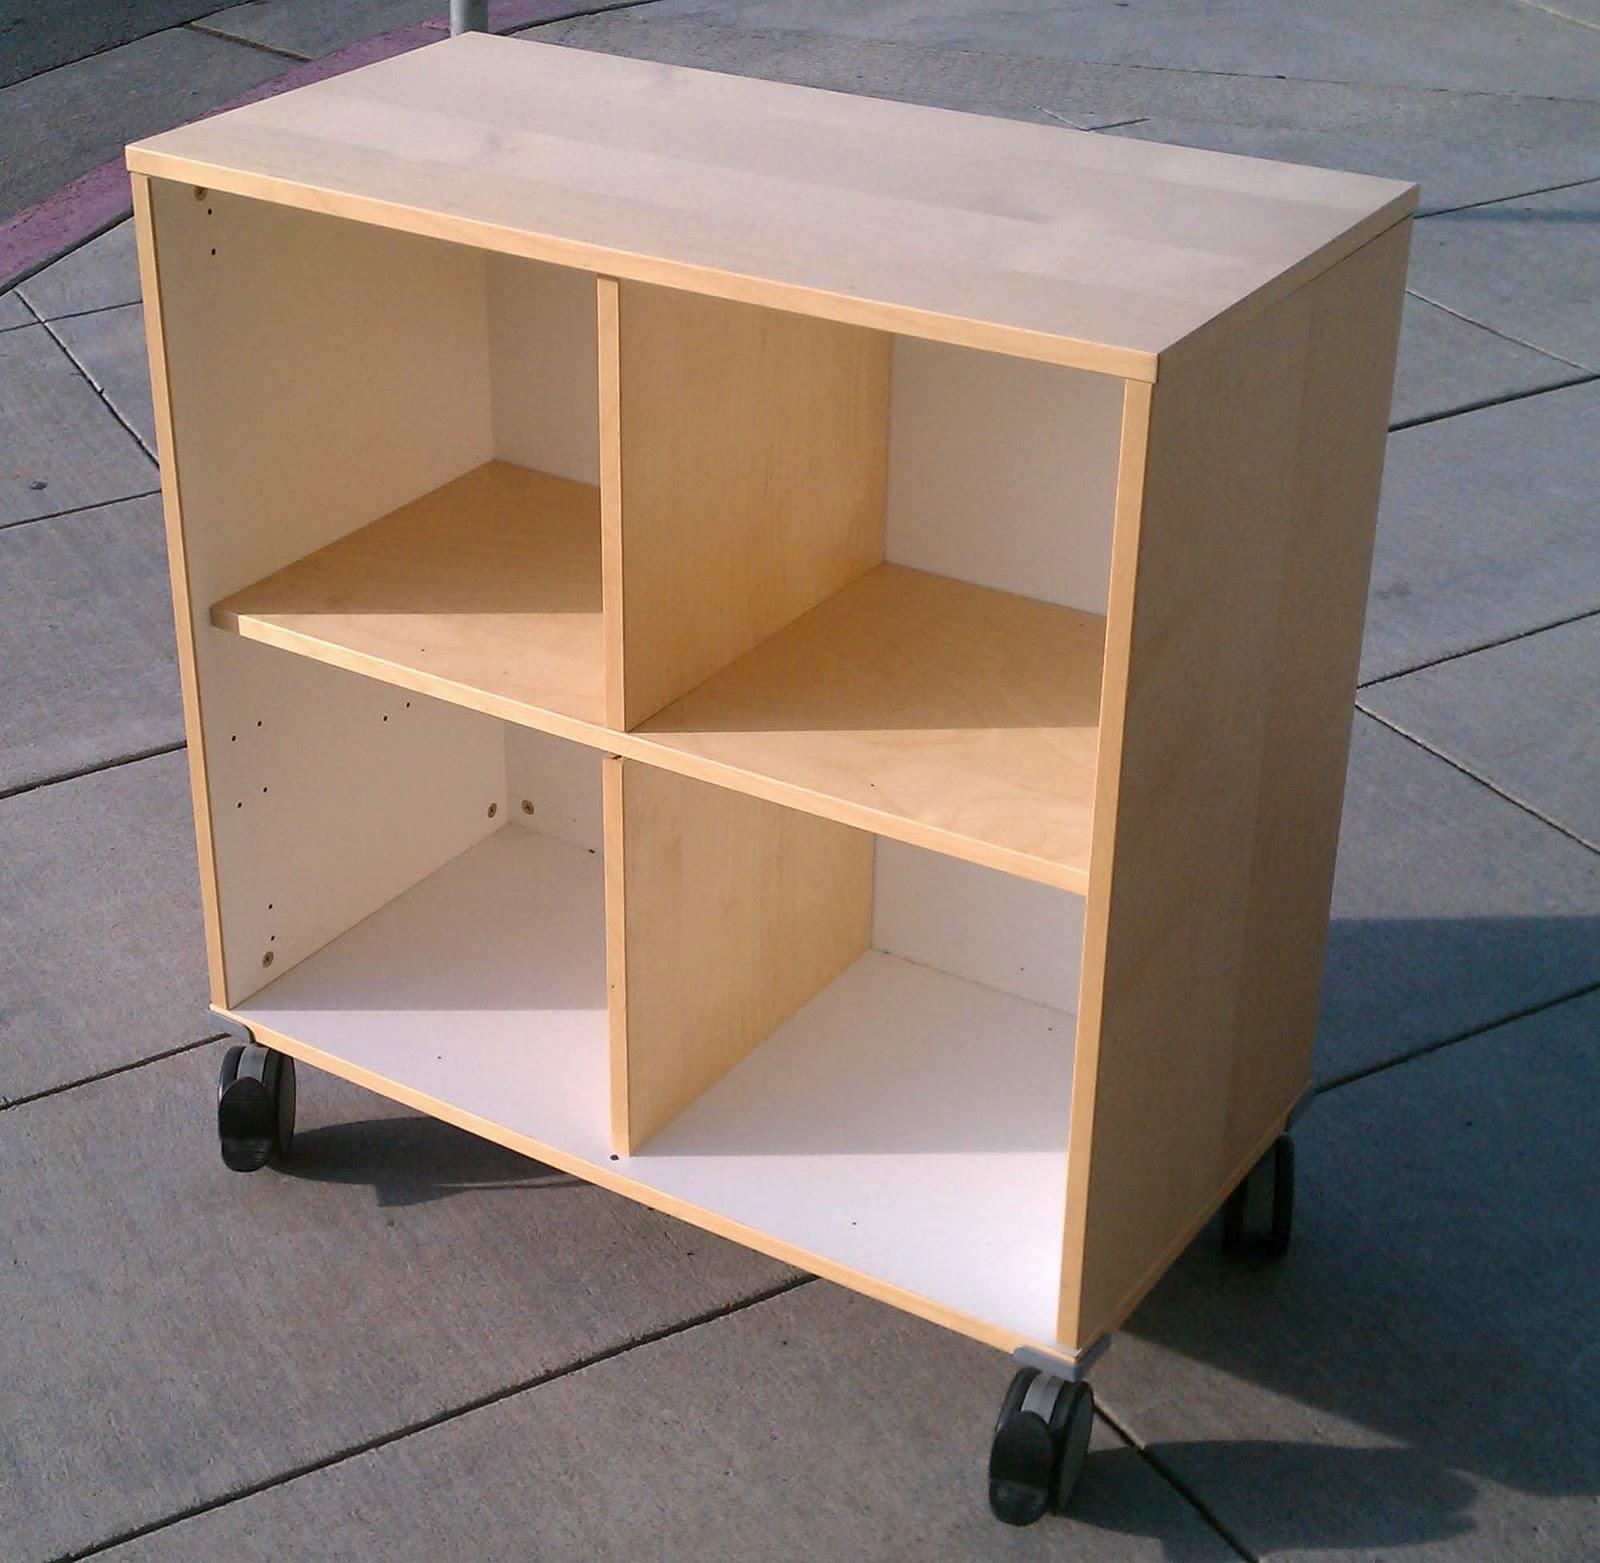 Ikea Storage Cart Listitdallas